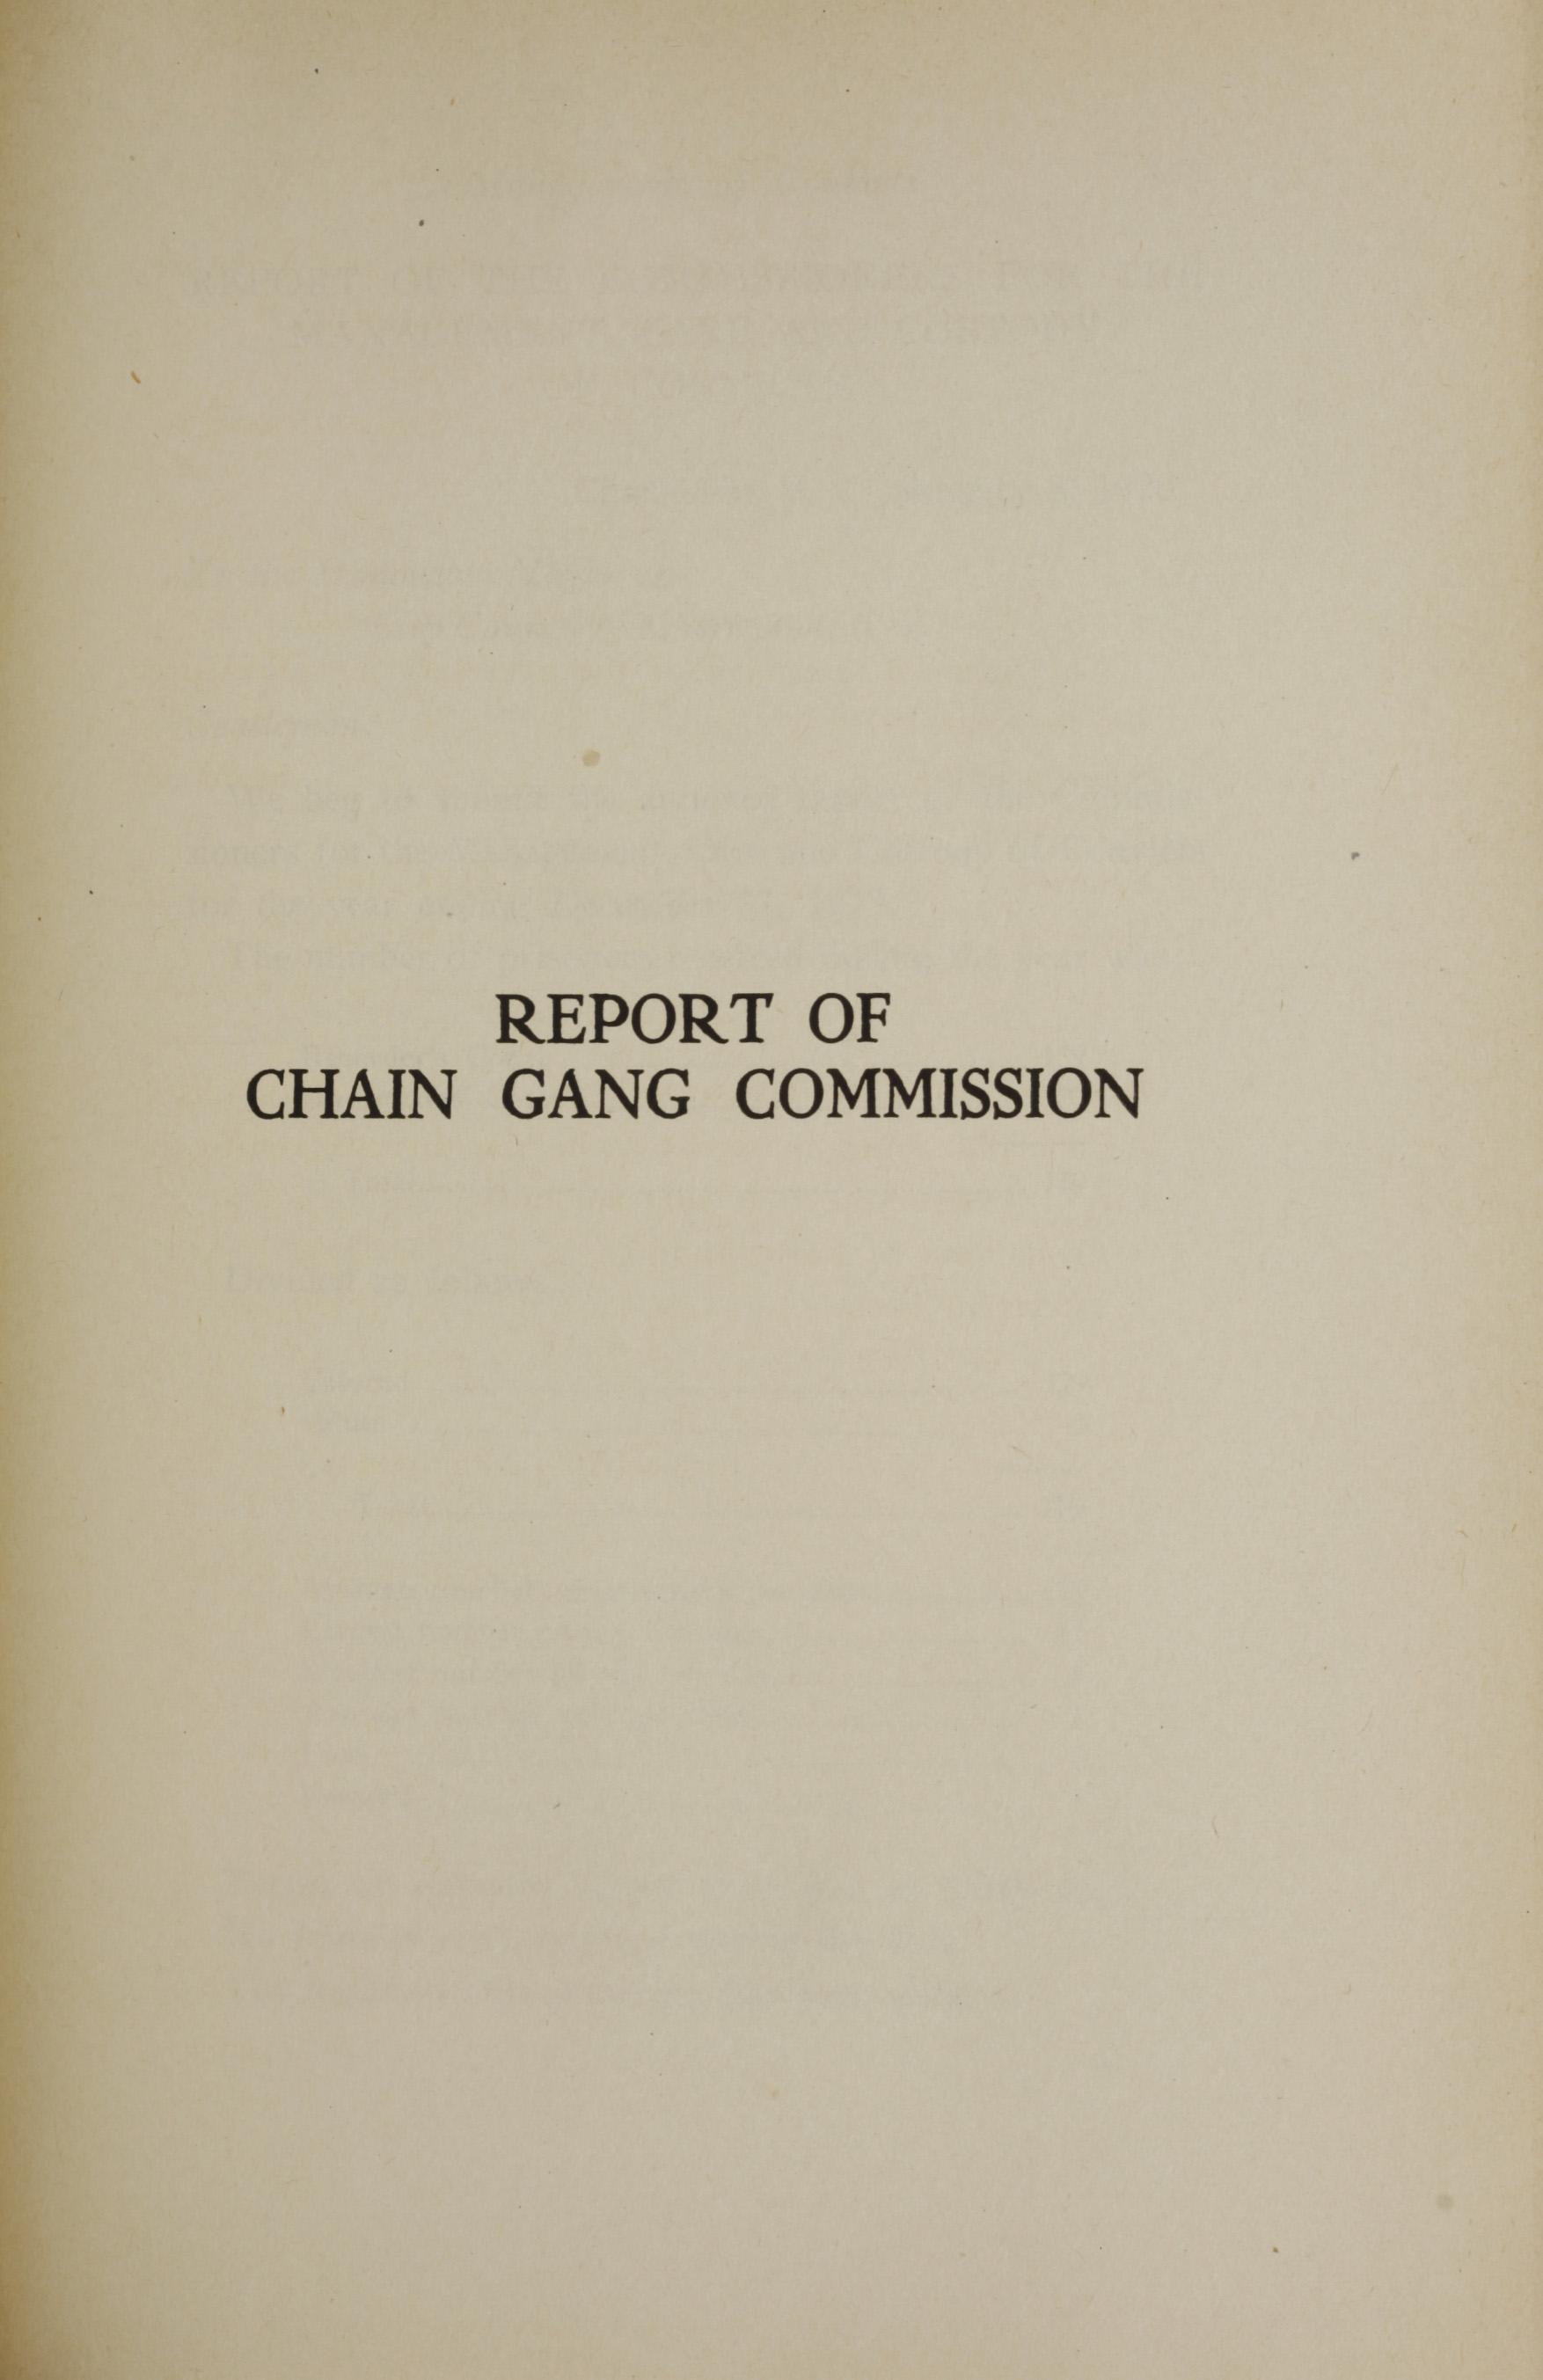 Charleston Yearbook, 1919, page 573